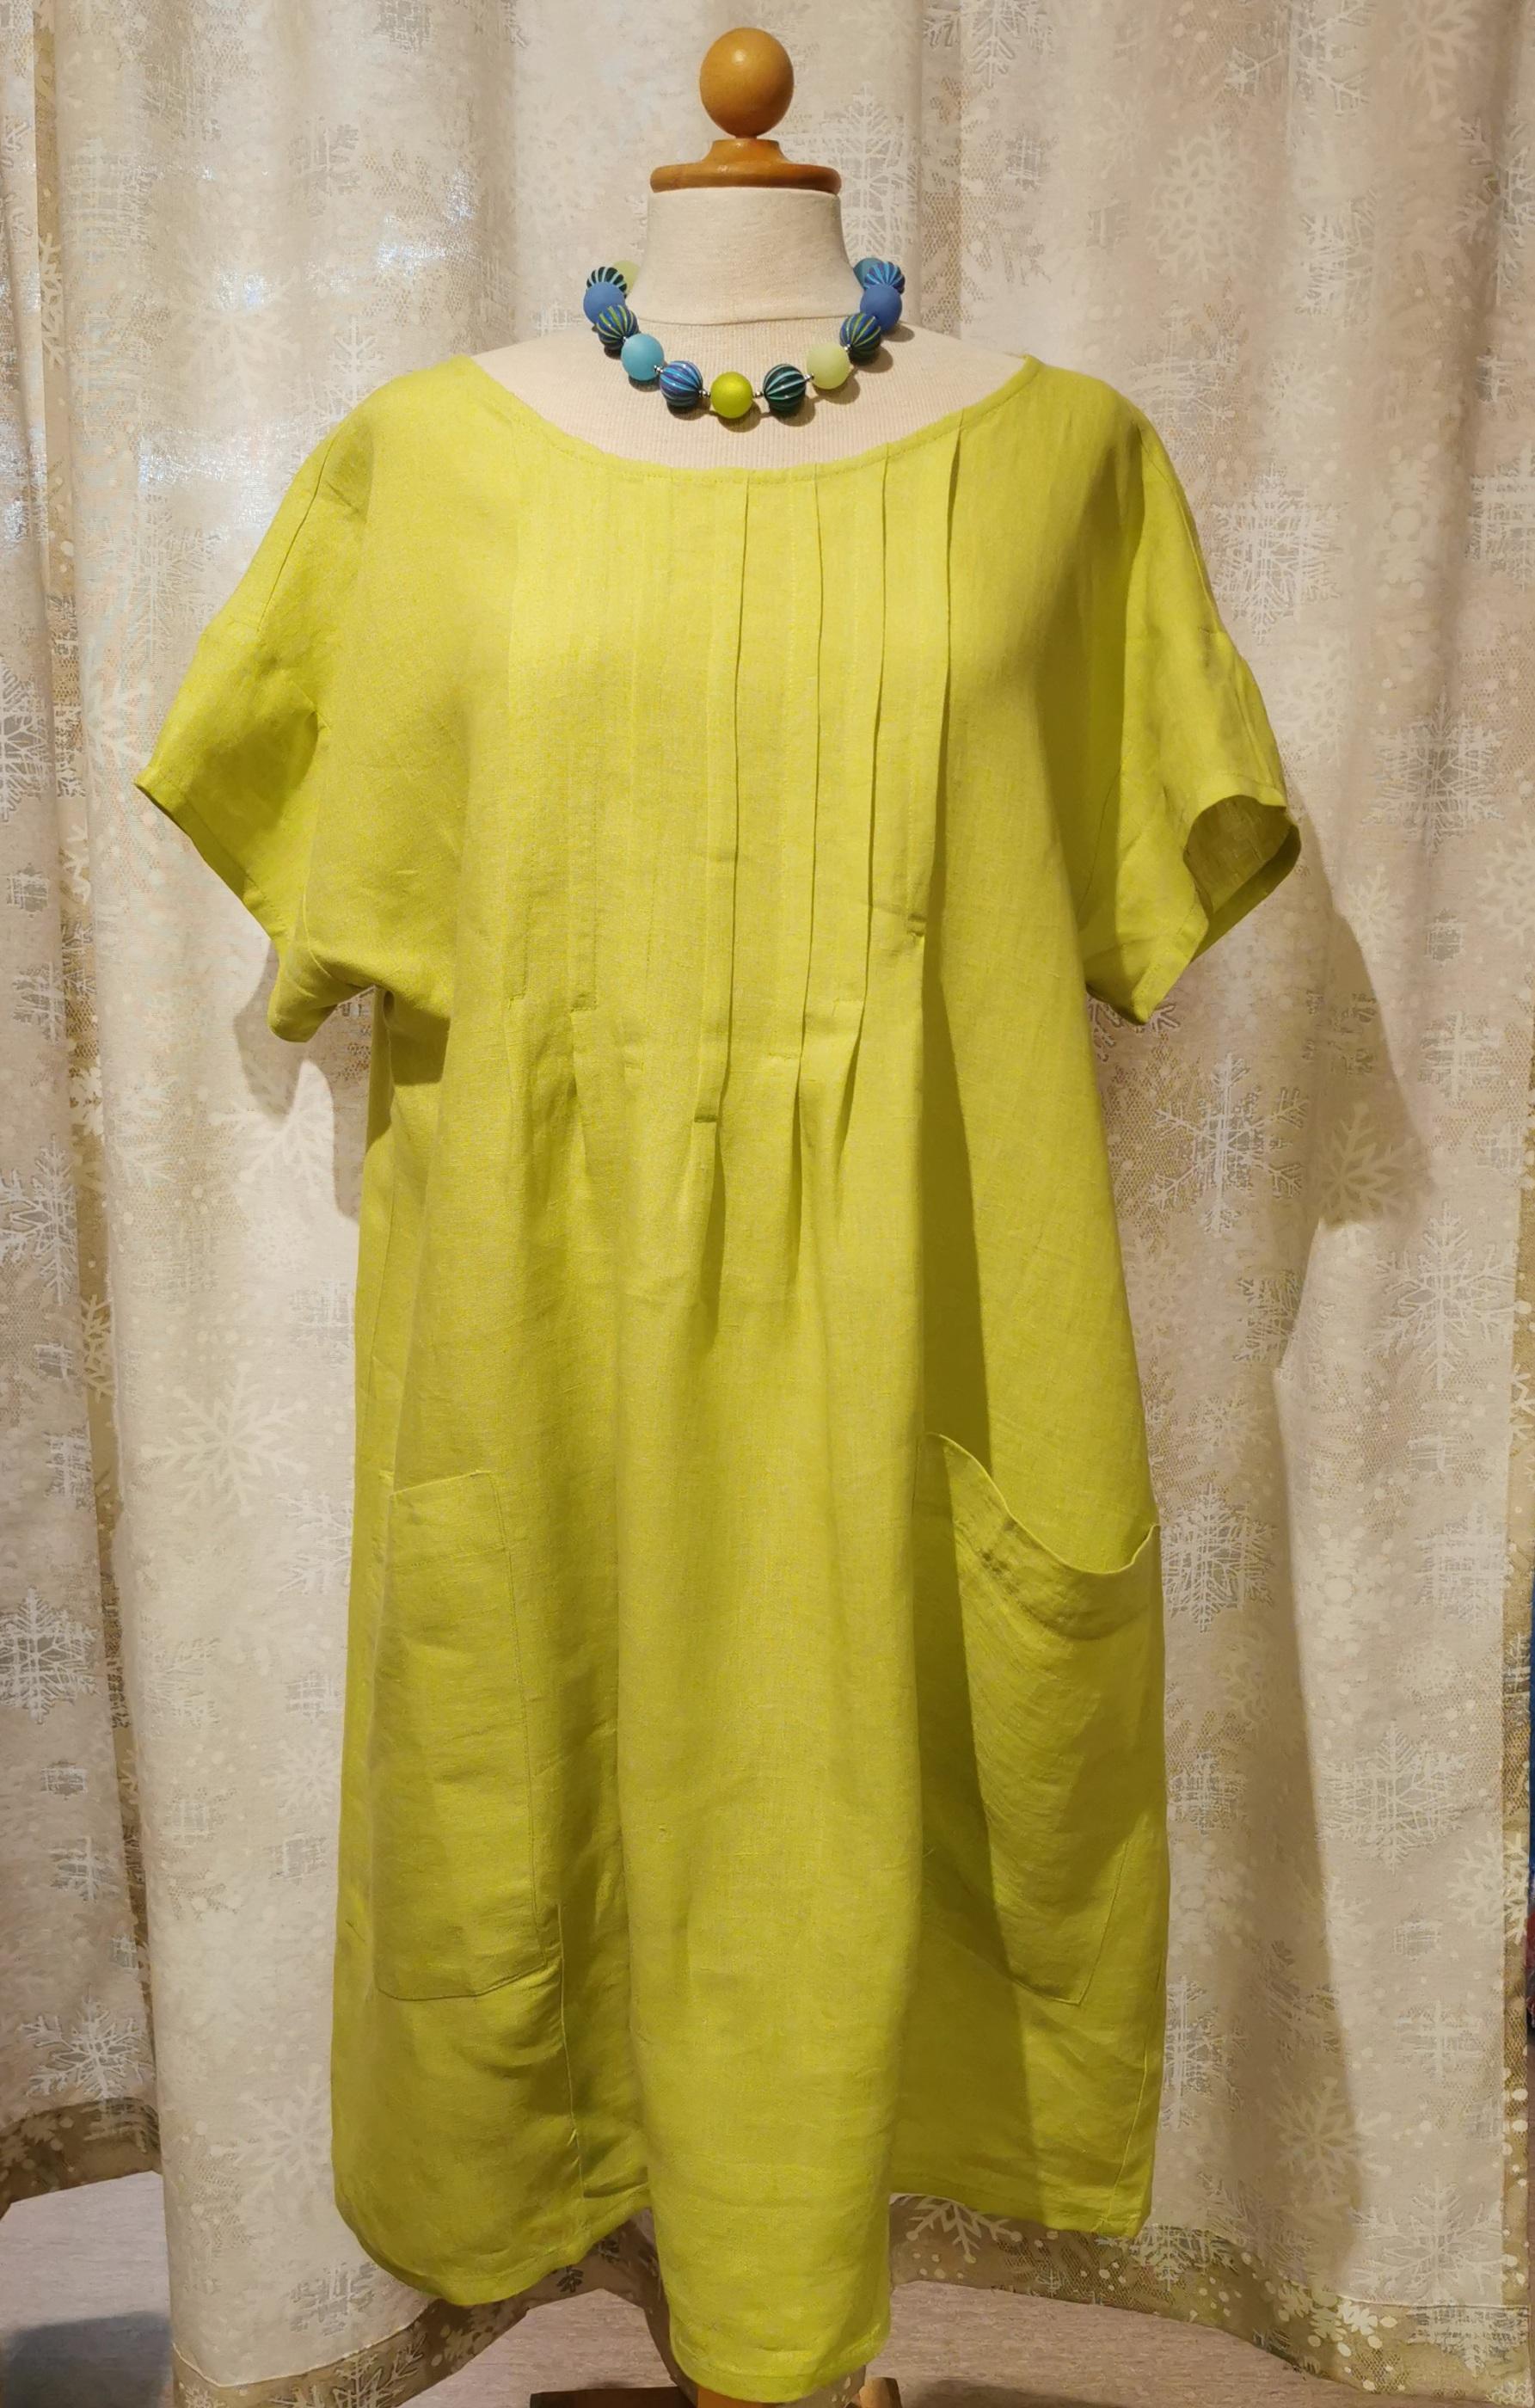 Baldino klänning 23-1039 Skattkistan